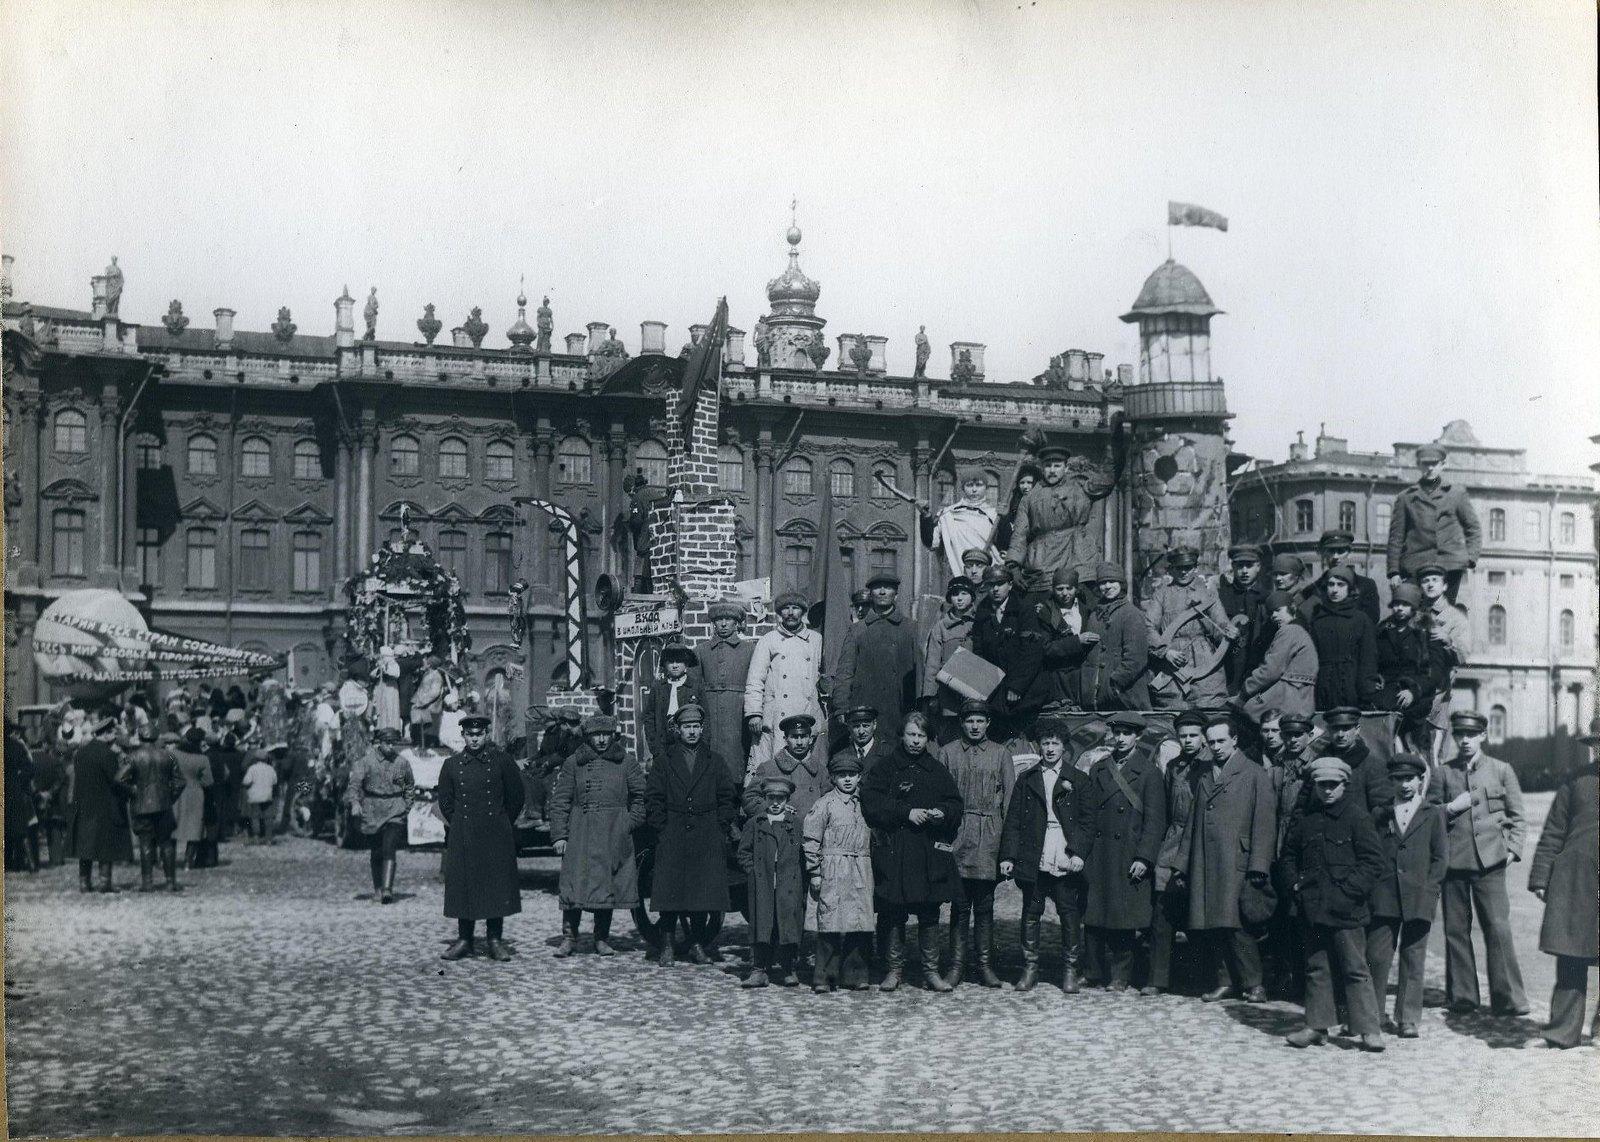 1918. Школа молодых коммунистов III Интернационала при бывшем императорском дворе